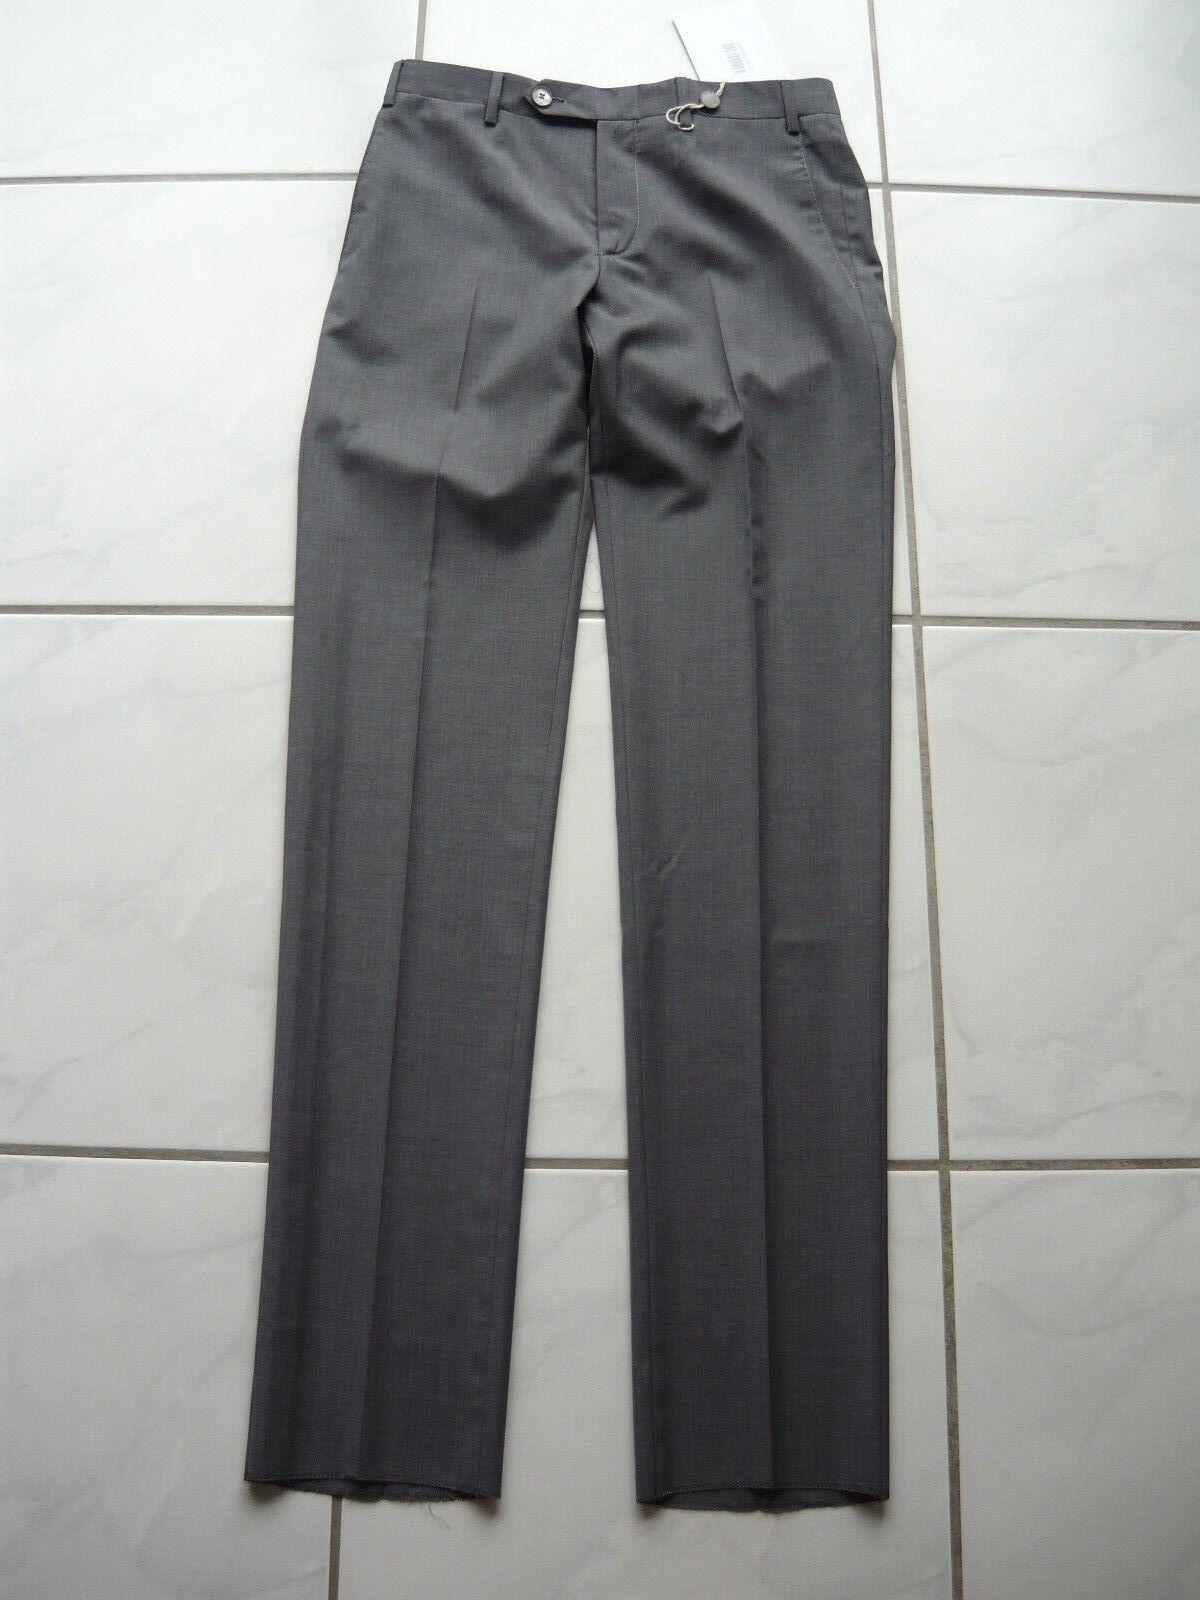 ZANELLA Hose grau Gr. 46 Schurwolle Mod. 111384 Bart D pants grau virgin wool